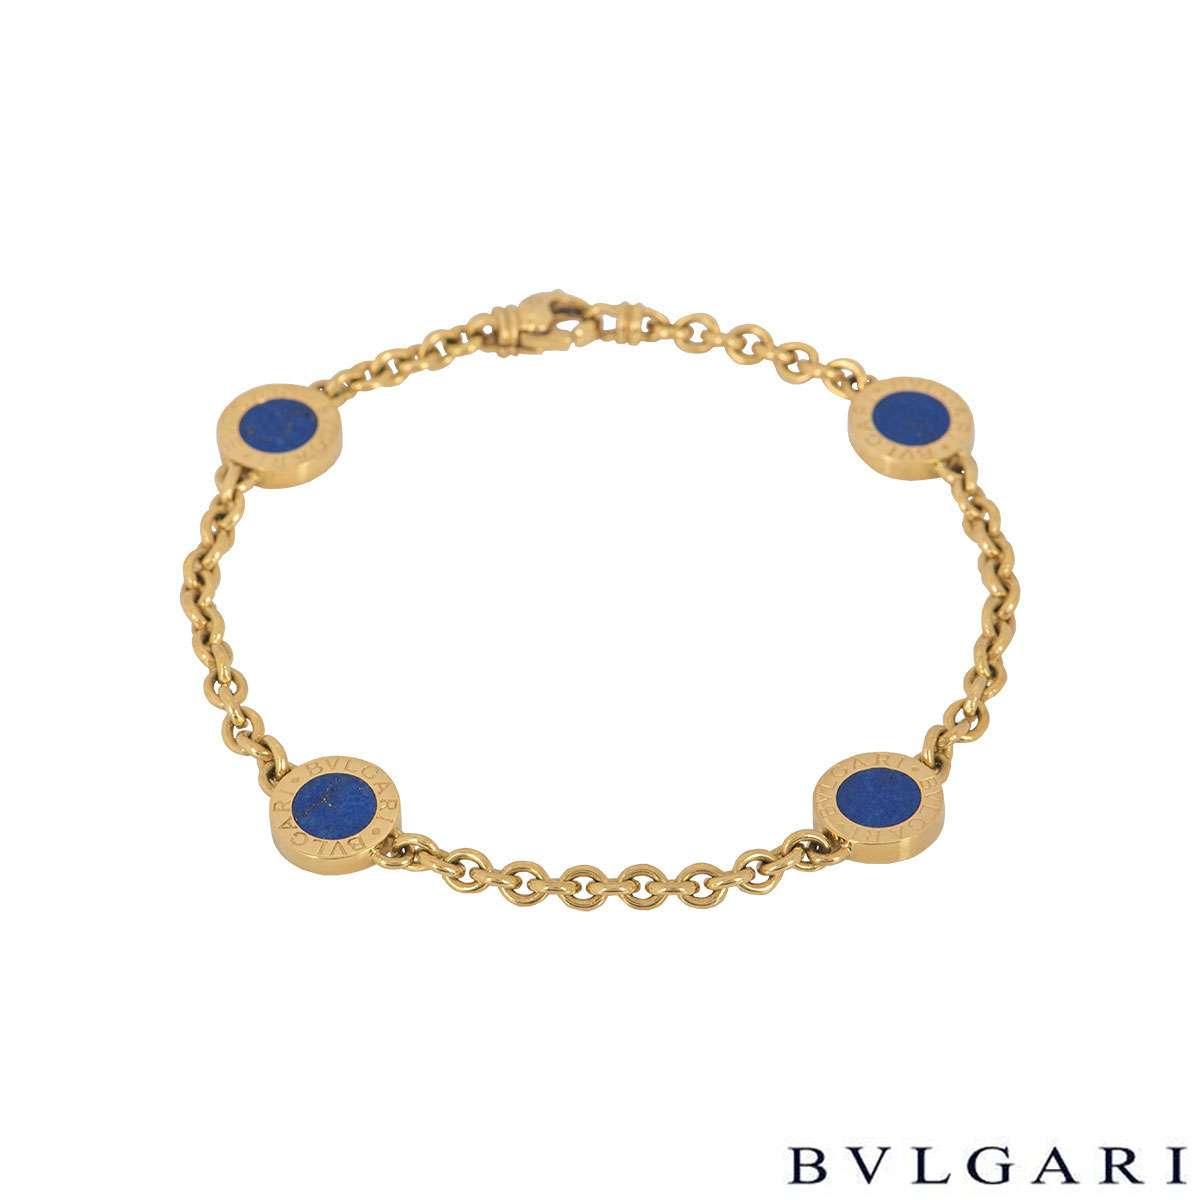 Bvlgari Bvlgari Yellow Gold Lapis Lazuli Bracelet